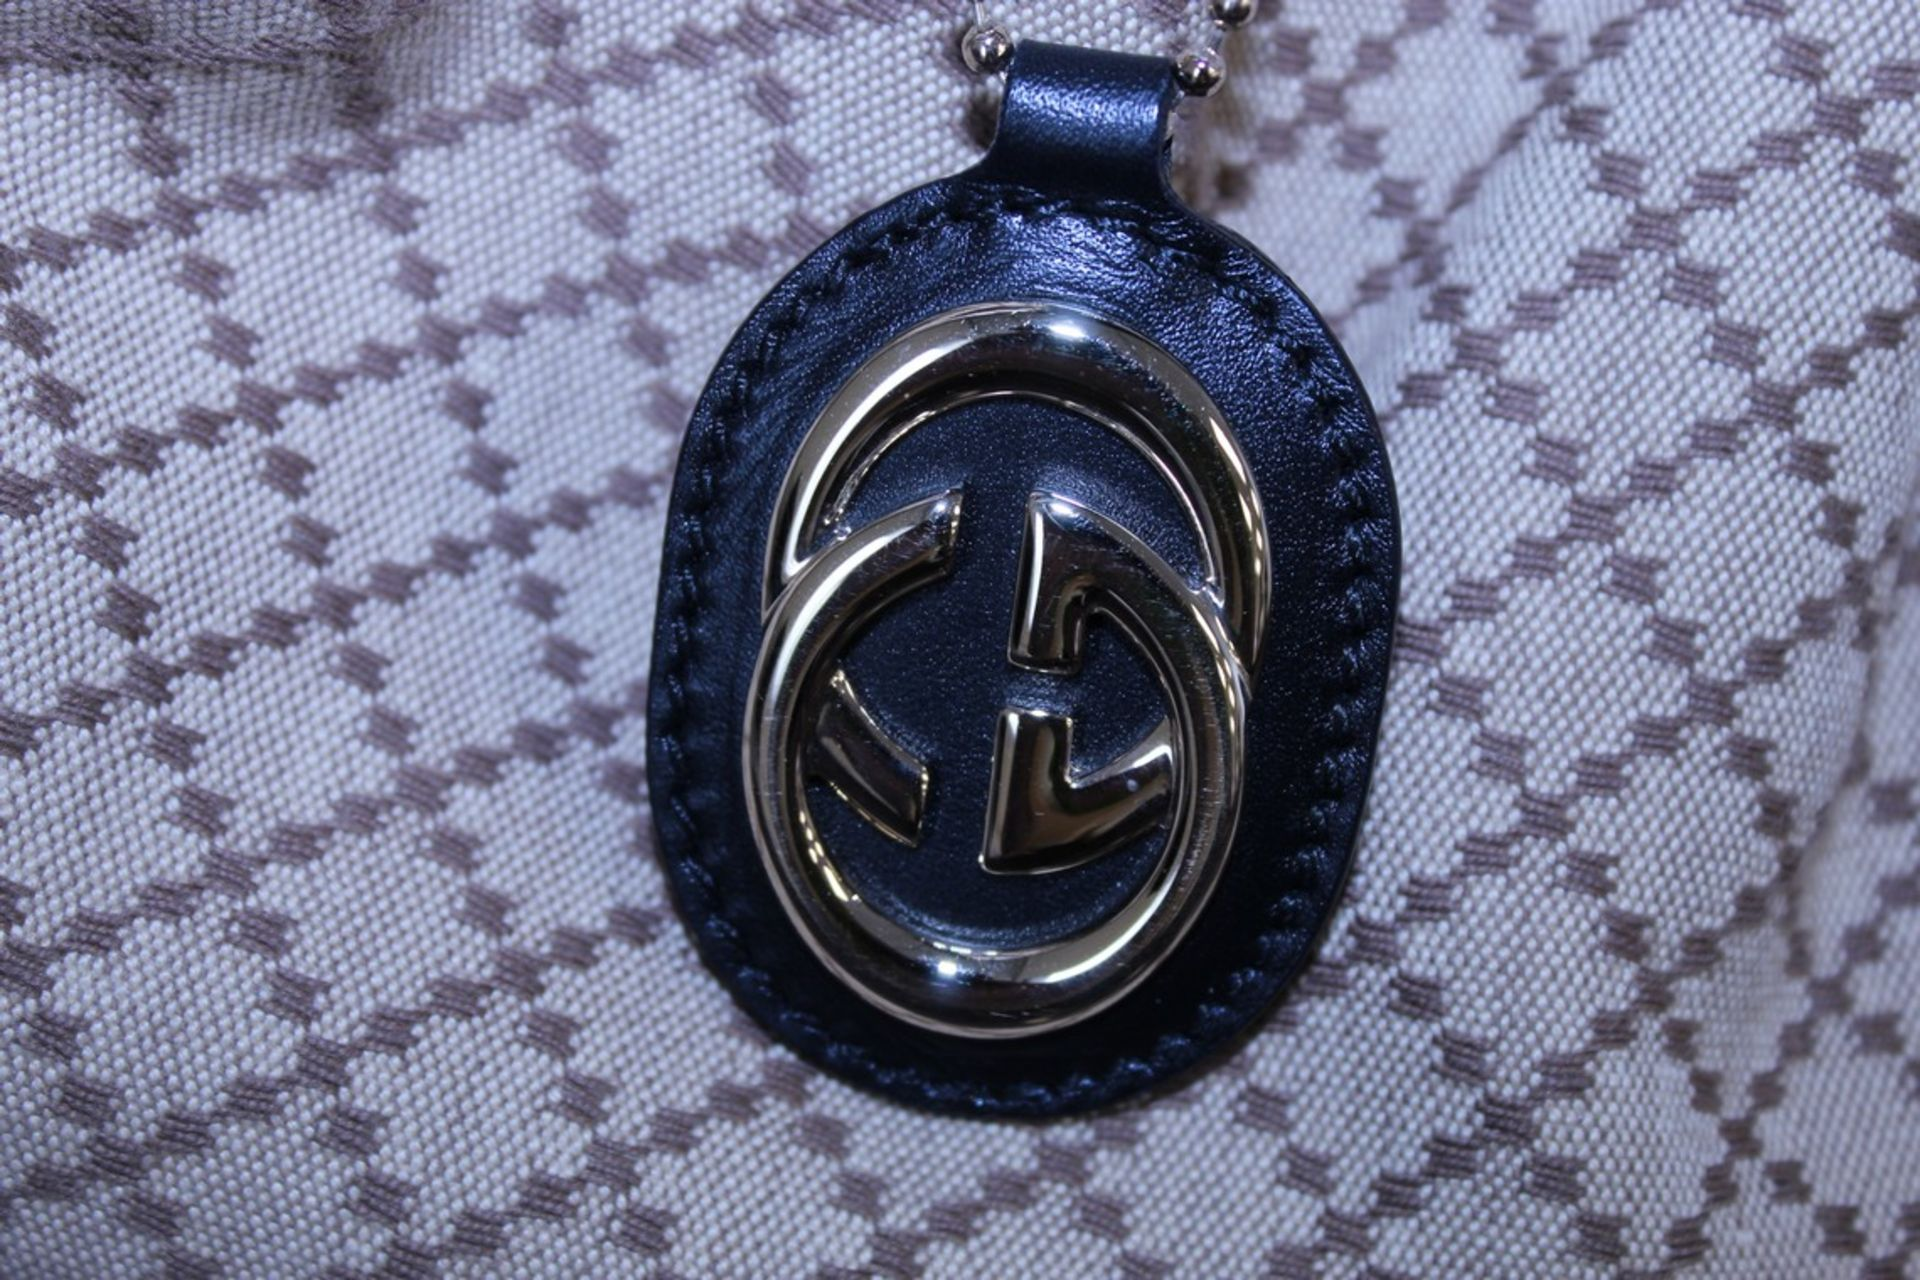 RRP £1,500 Gucci Sukey Medium Shoulder Bag, Beige/Black Diamante Canvas, 37.5X26X10Cm (Production - Image 3 of 4